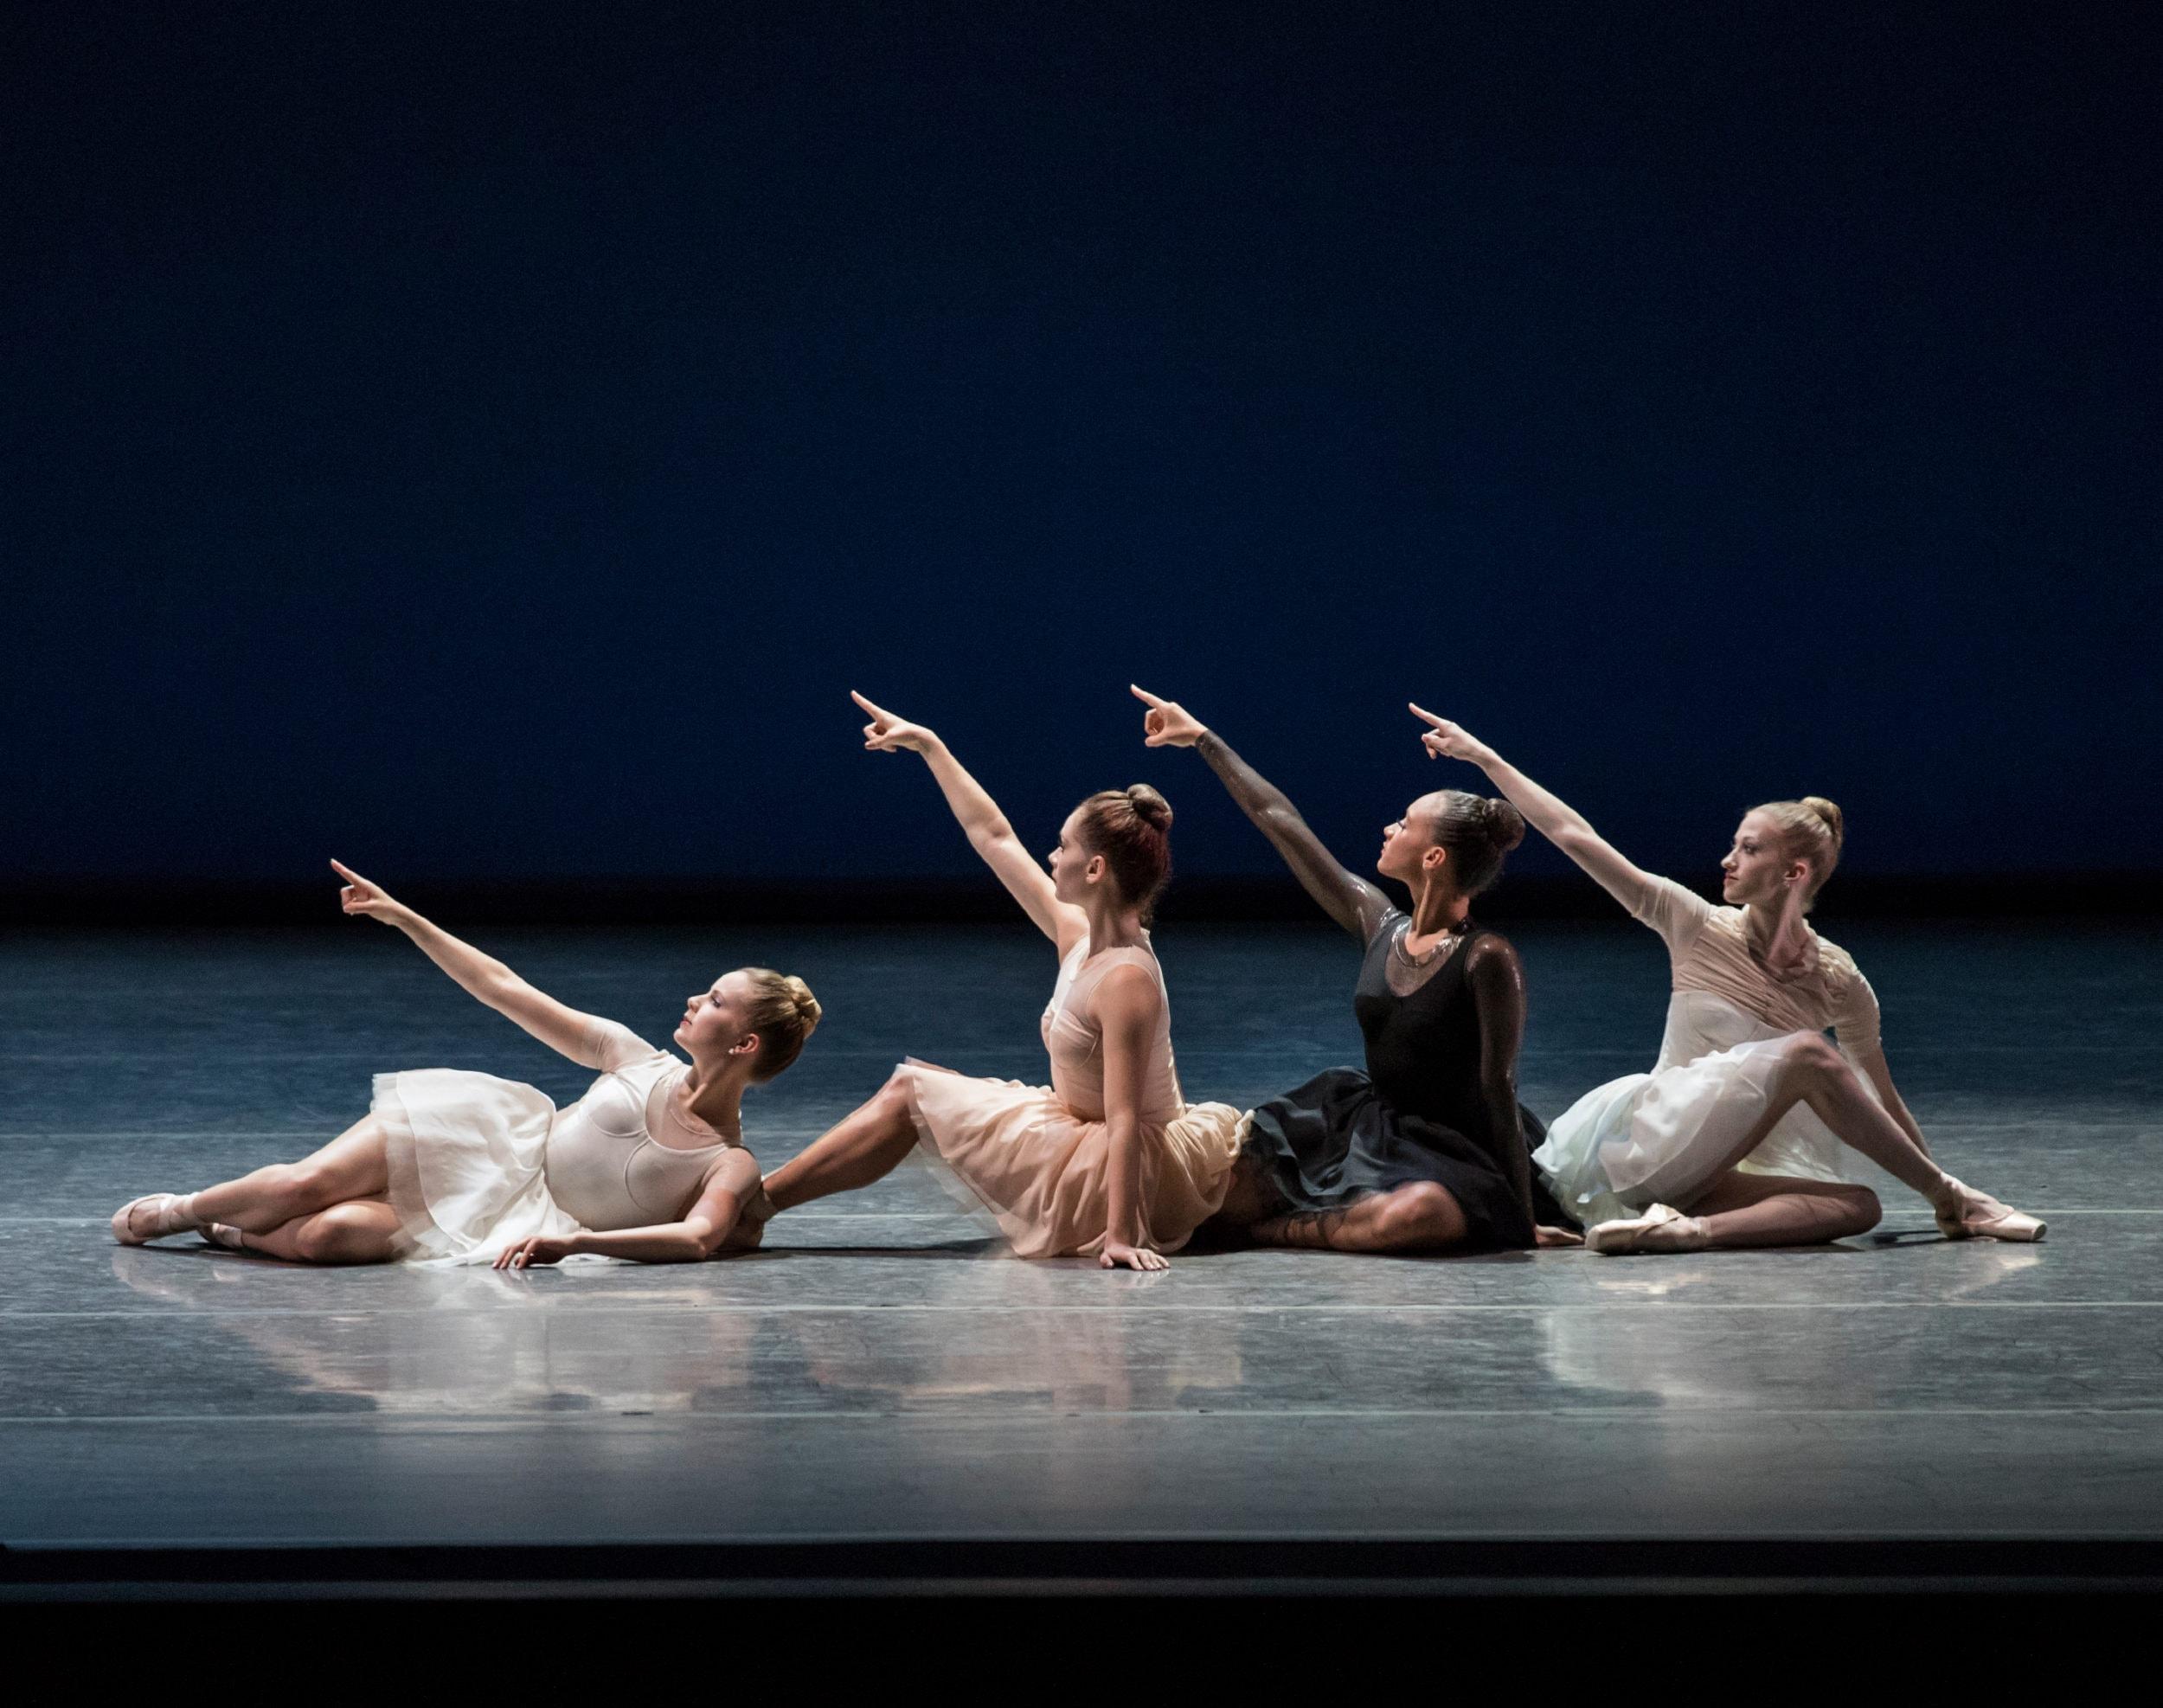 New York City Ballet in 'Composer's Holiday' by Gianna Reisen. Photo by Paul Kolnik.